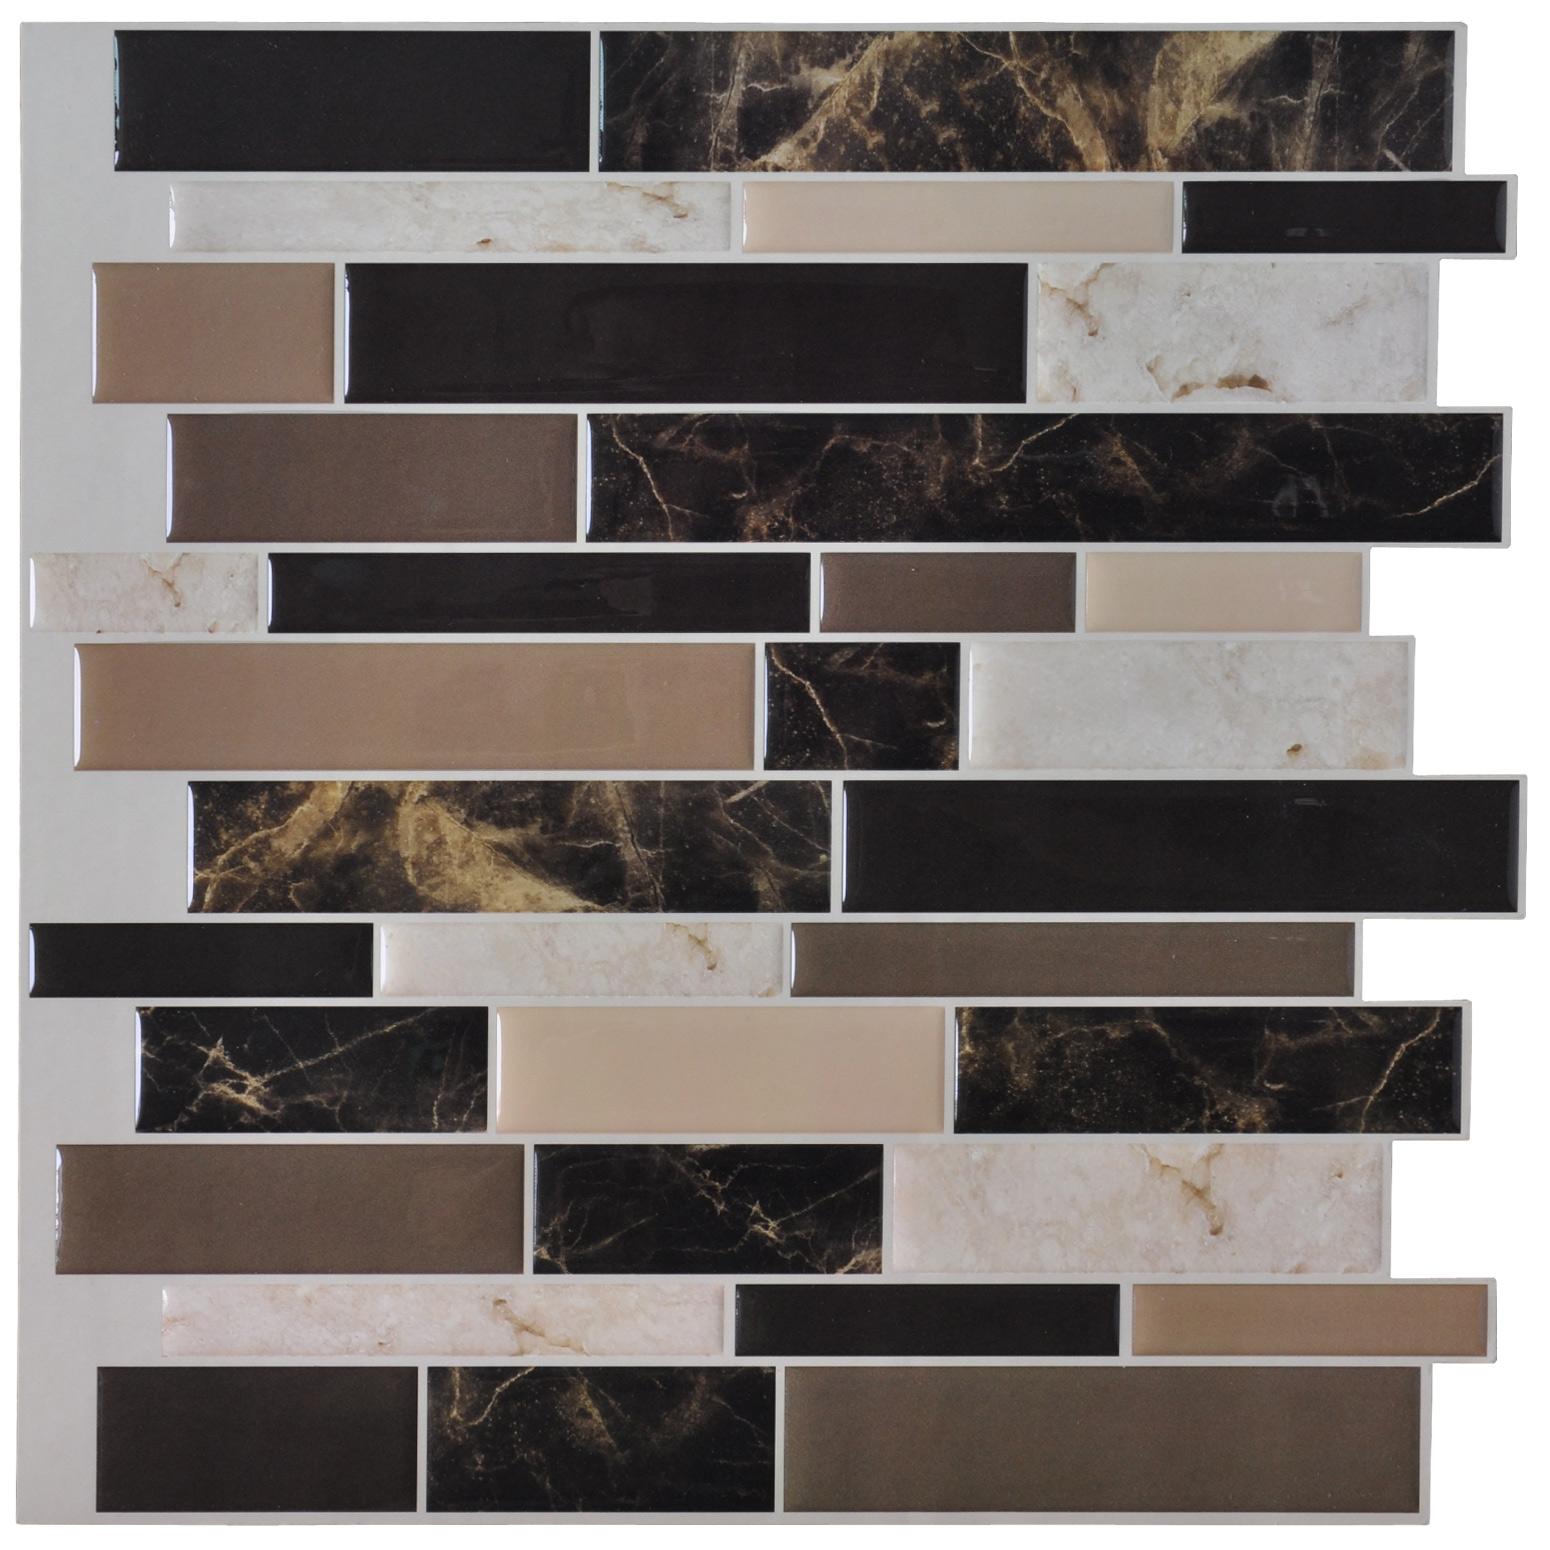 L And Stick Wall Tile Kitchen Backsplash Gray Design 12 X12